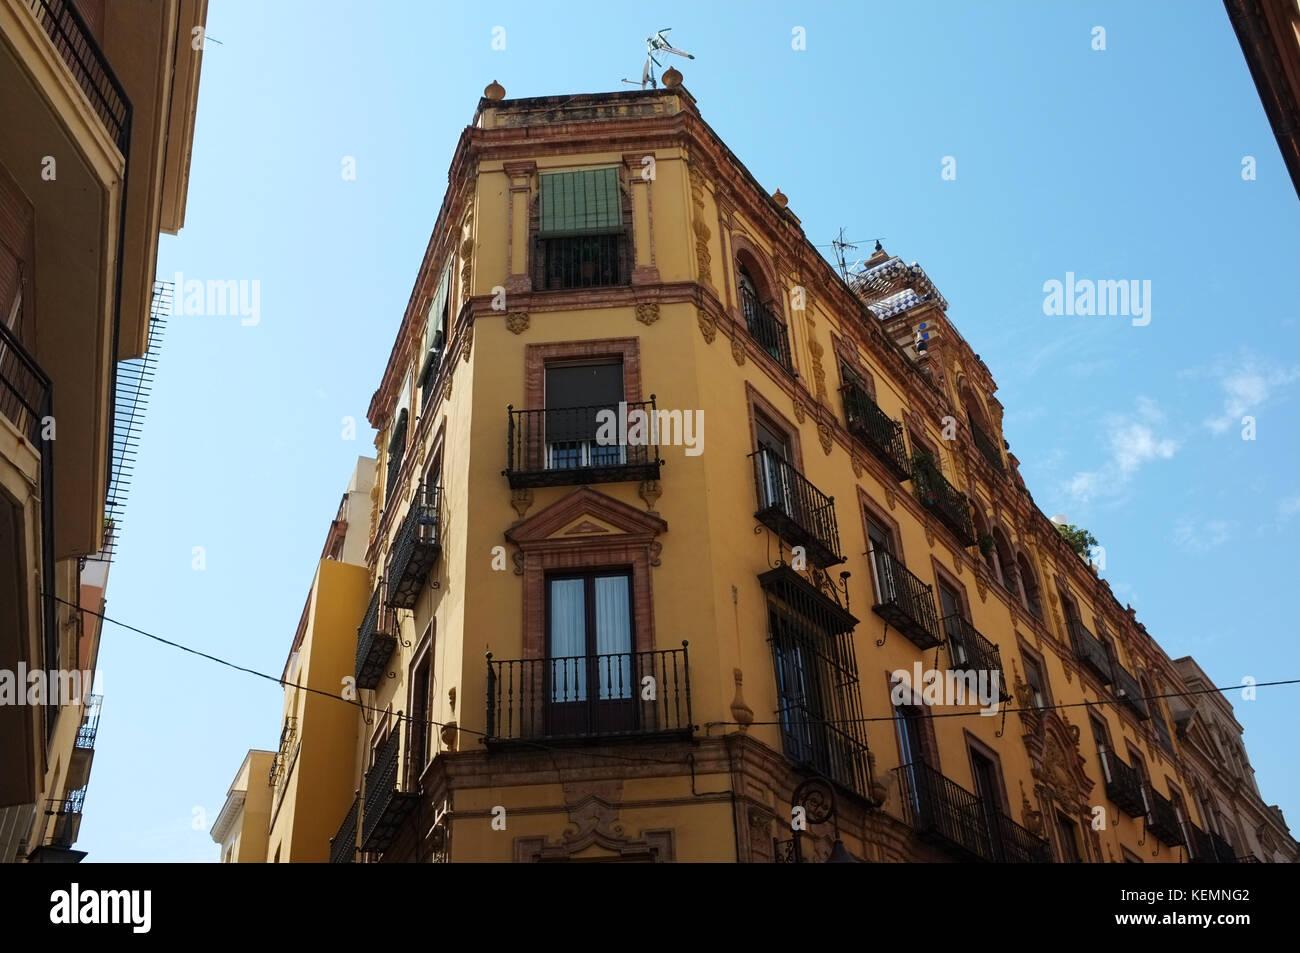 A building in central Seville/Sevilla, Andalucia, Spain, September 2017 - Stock Image